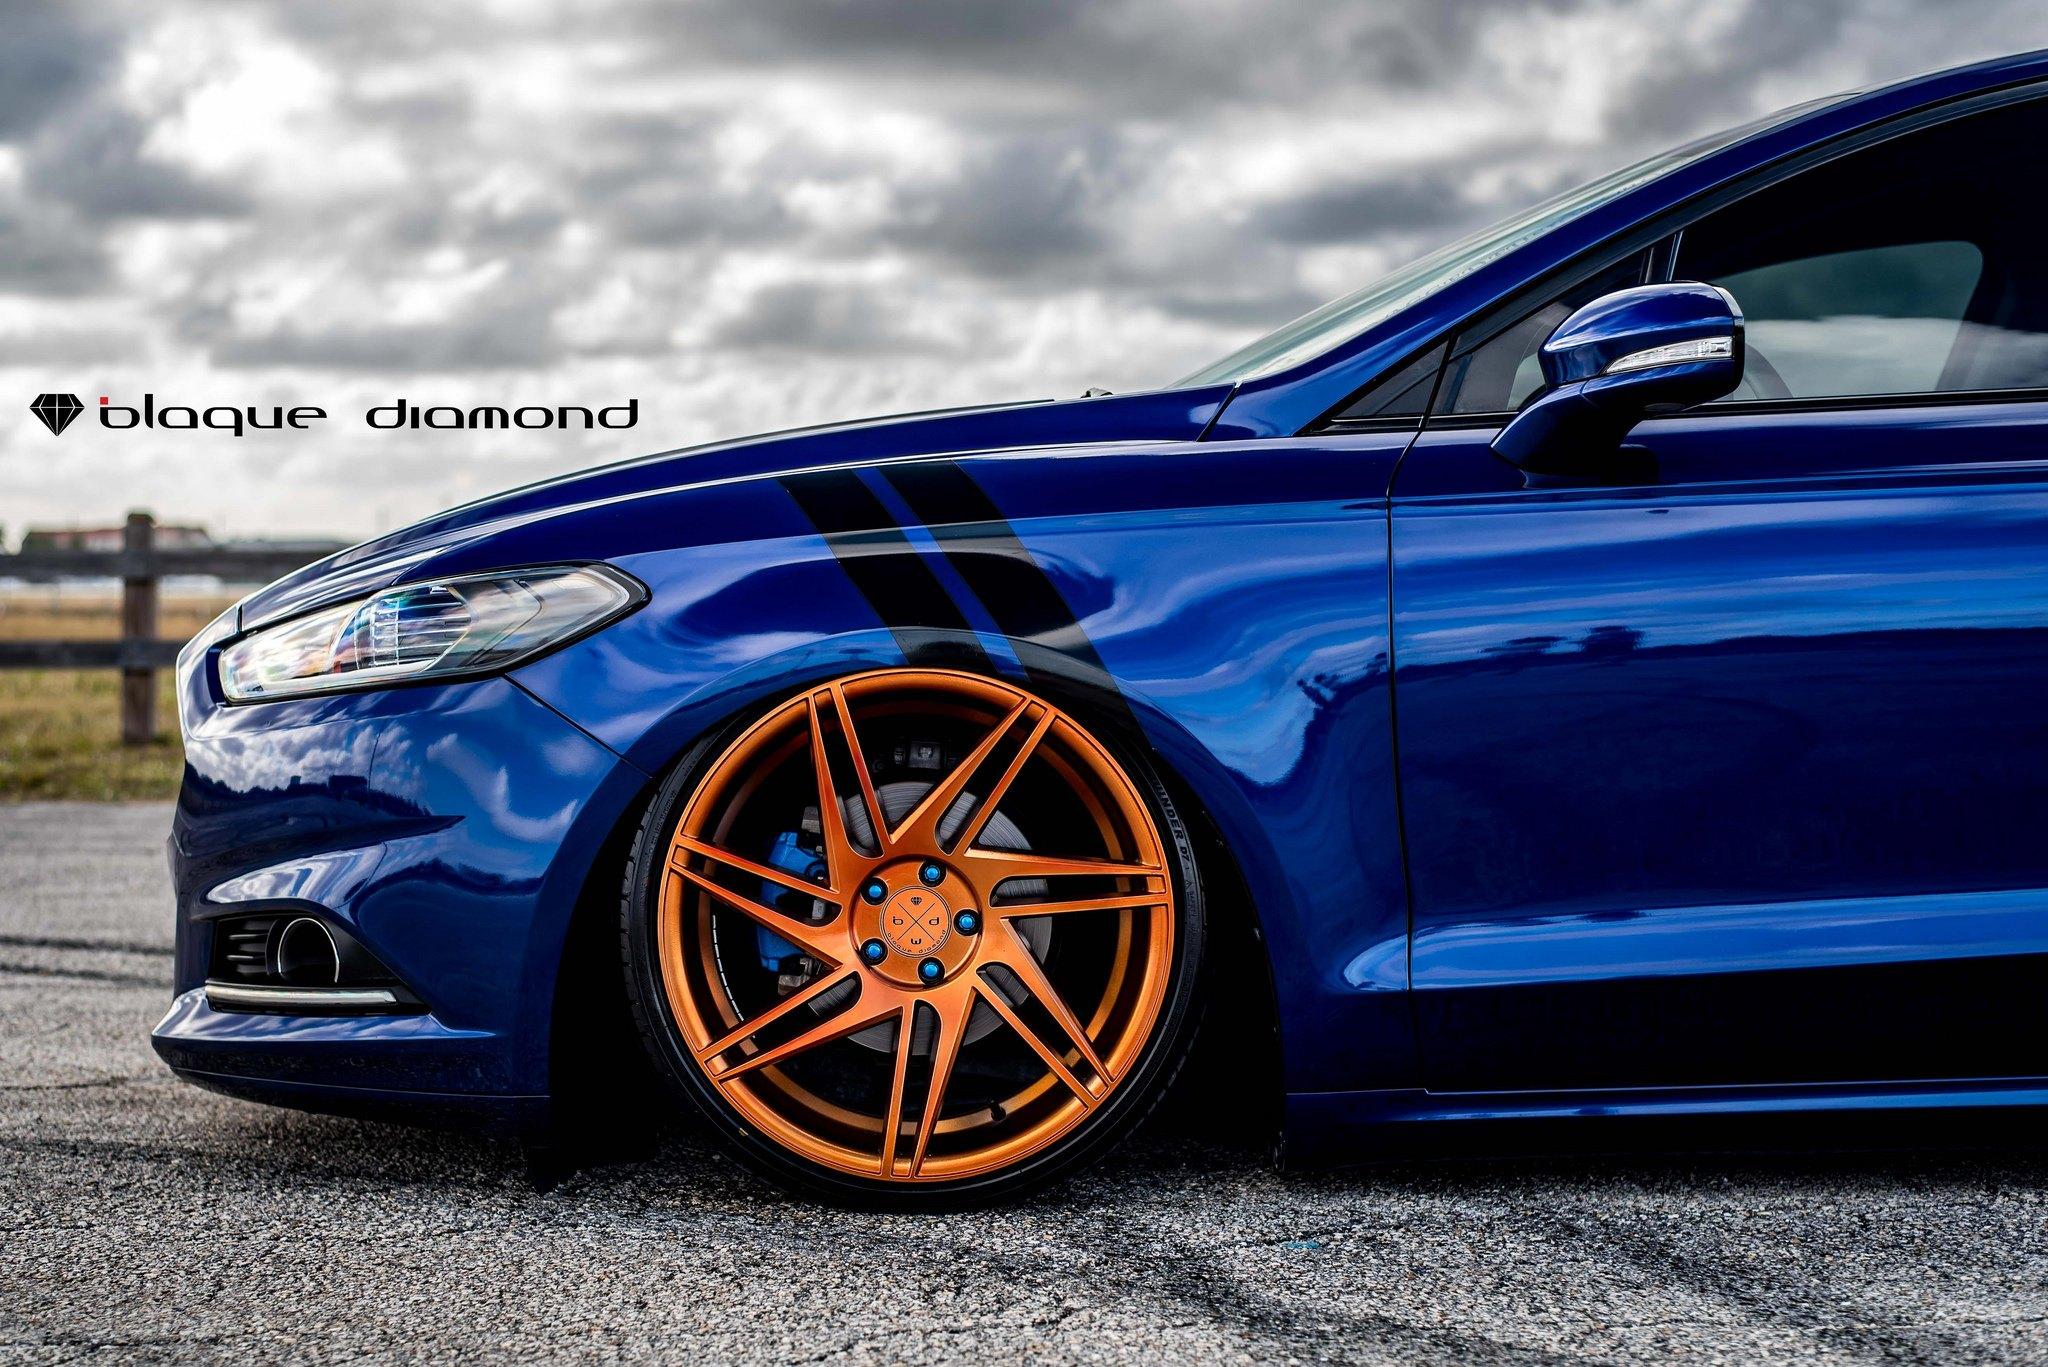 Slammed Ford Fusion on Insane Rims by Black Diamond — CARiD Gallery